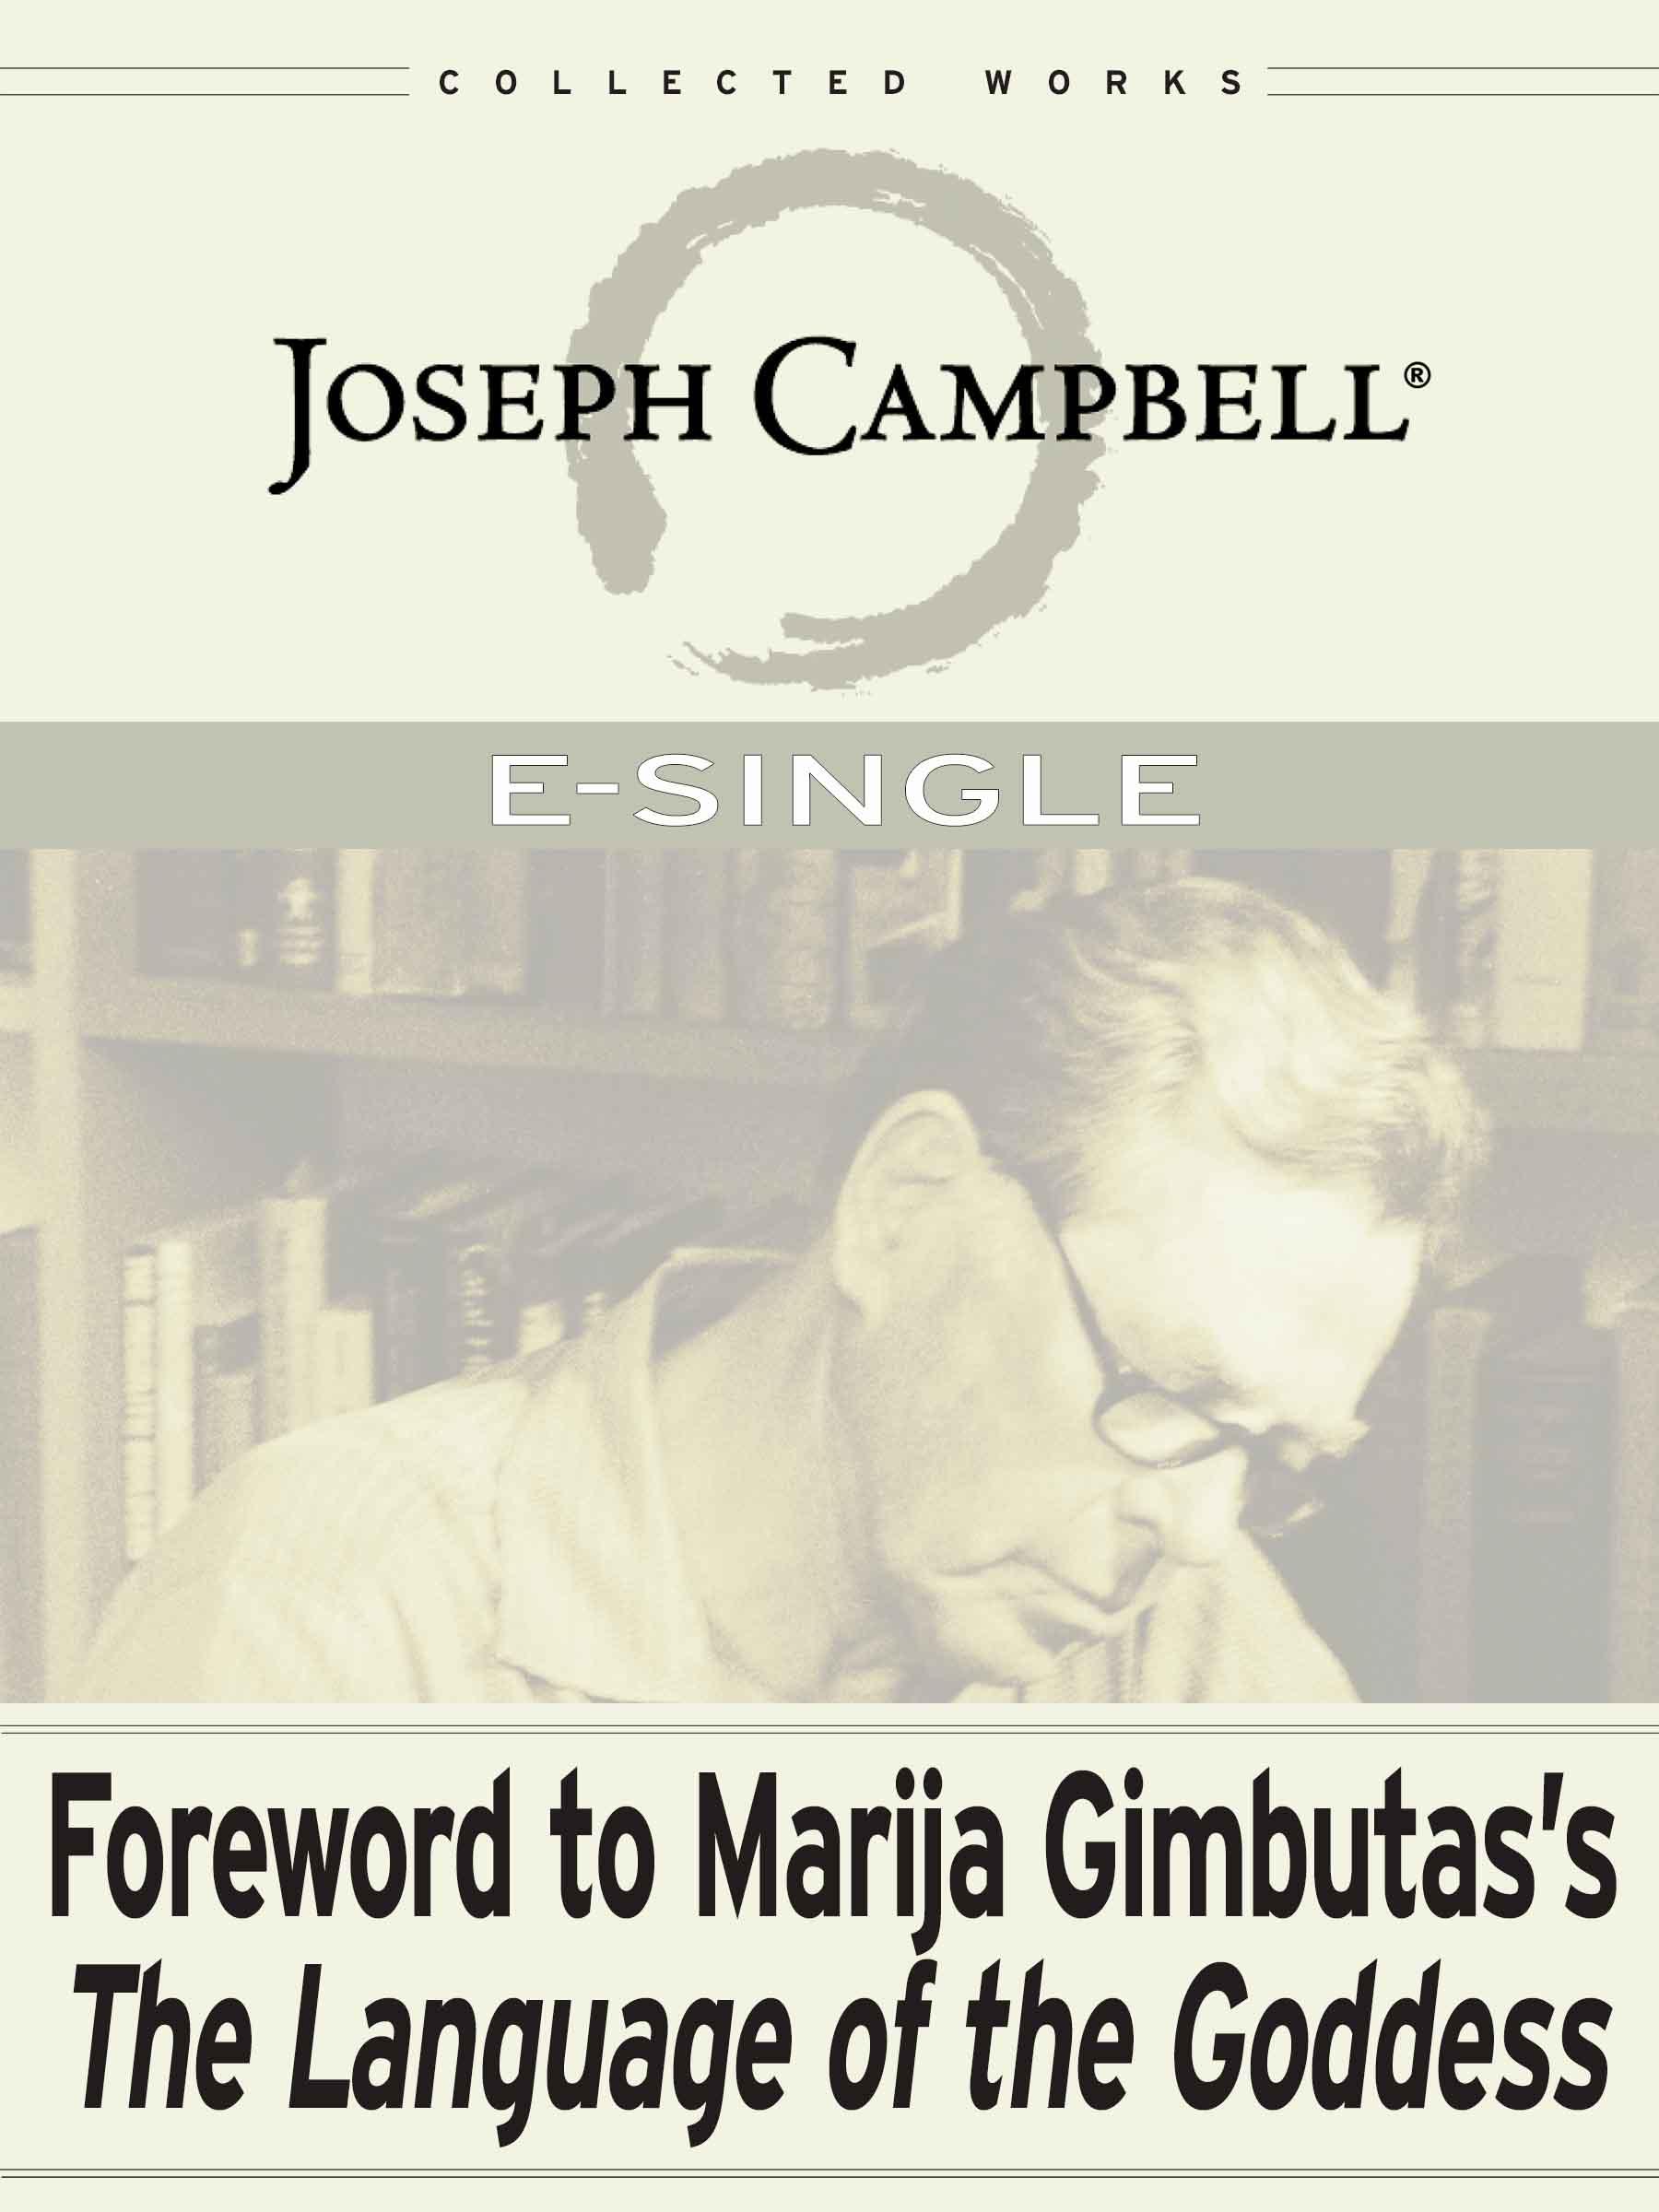 Foreword to Marija Gimbutas's The Language of the Goddess (Esingle)